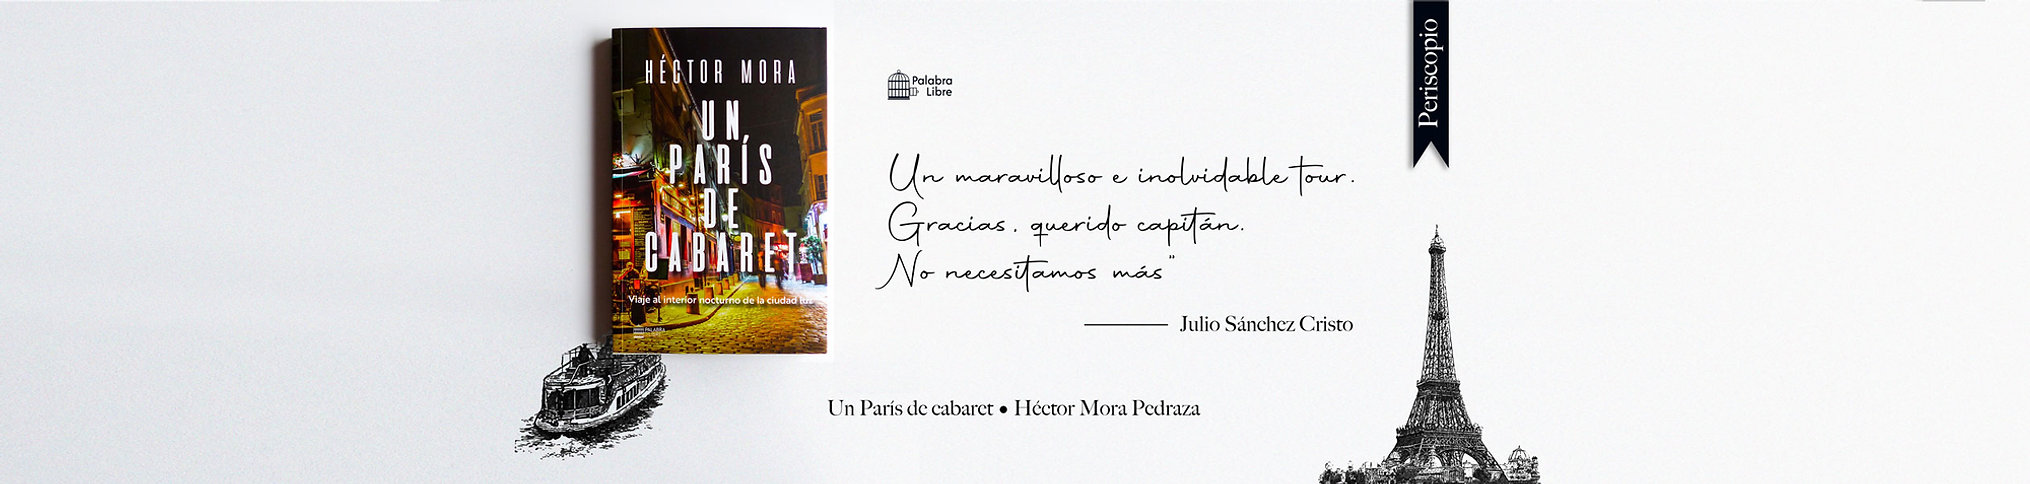 Banner-PARIS.jpg